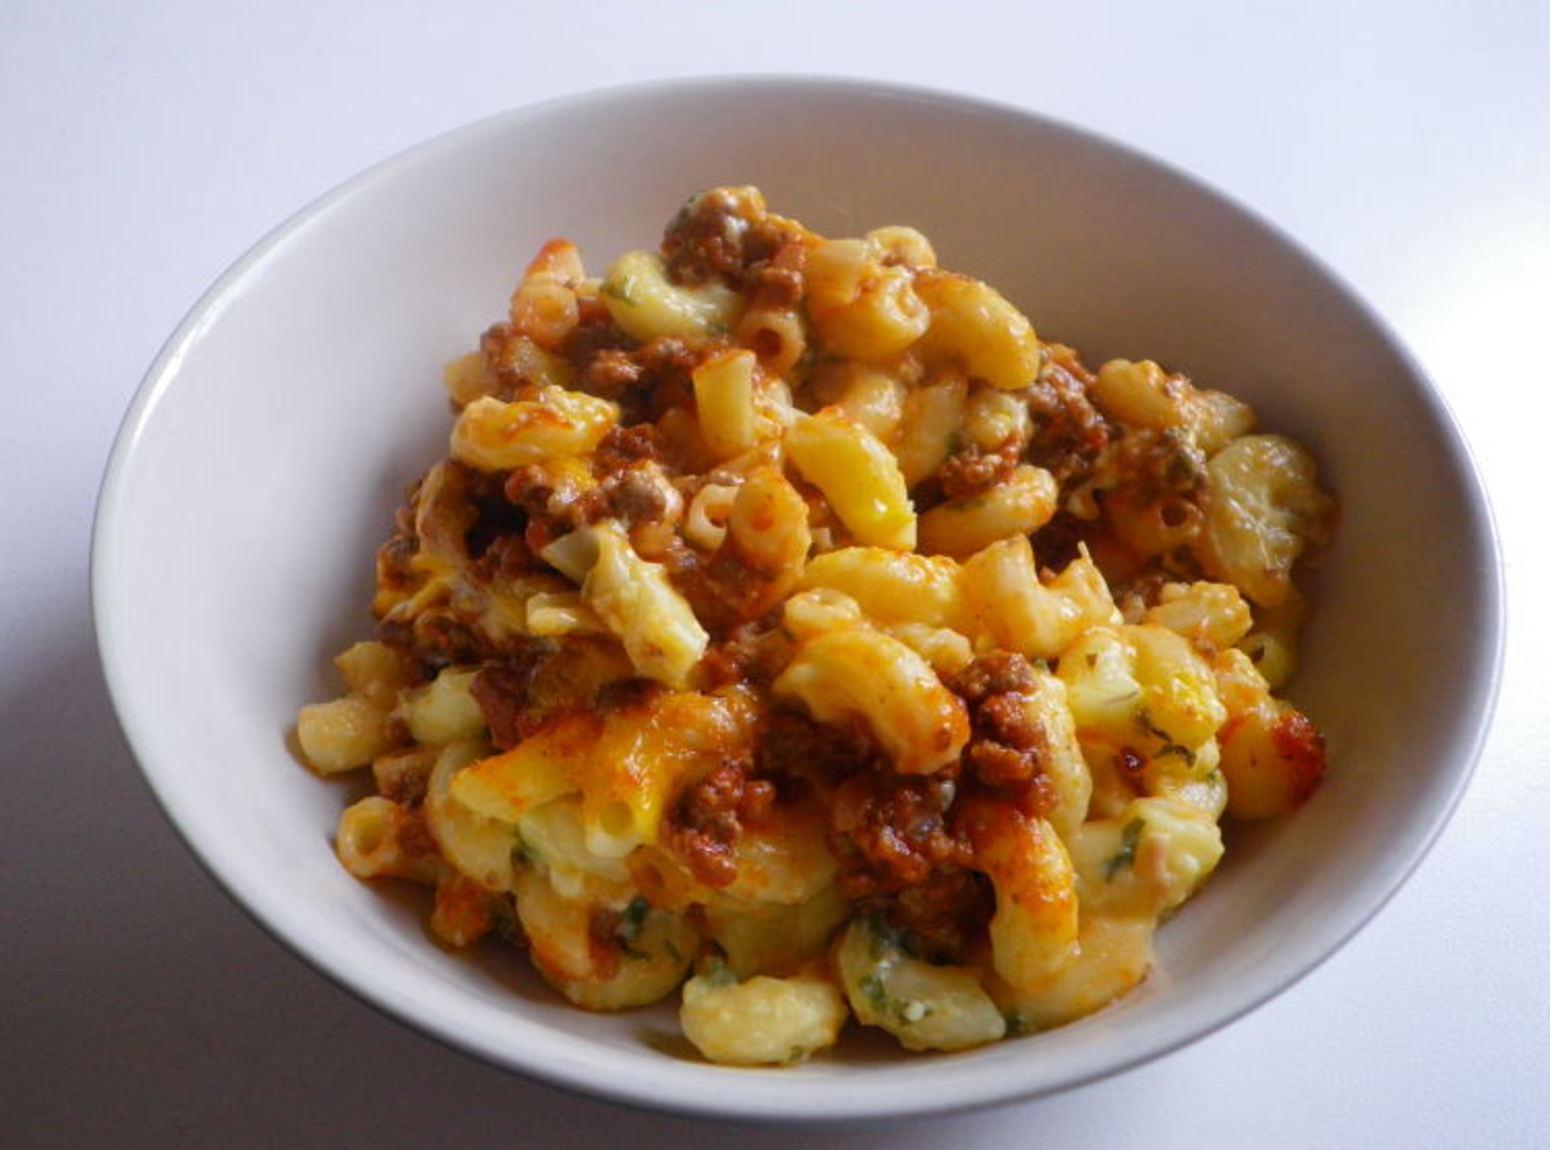 Ground Beef Pasta Casserole  Ground Beef Macaroni Casserole Recipe